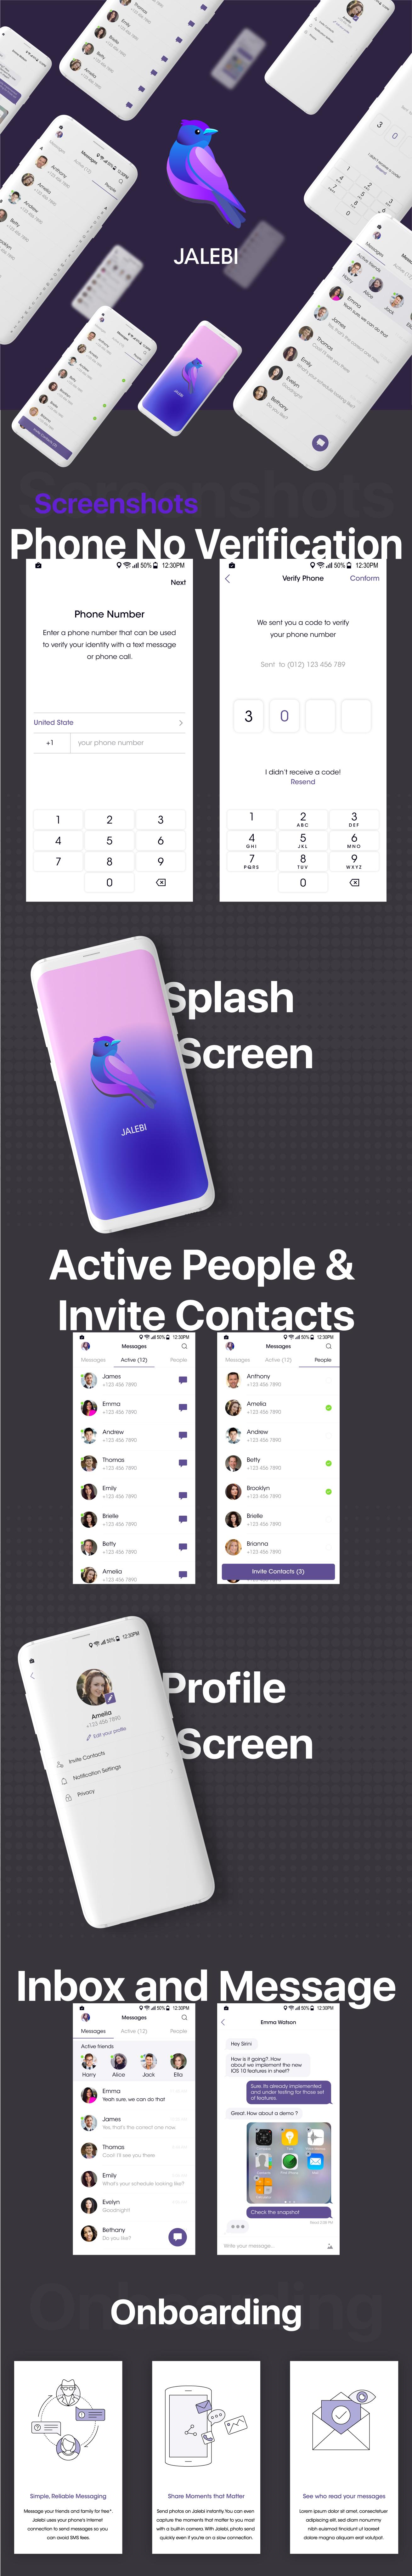 Jalebi - Android Firebase Real-time Chat Messenger - 1